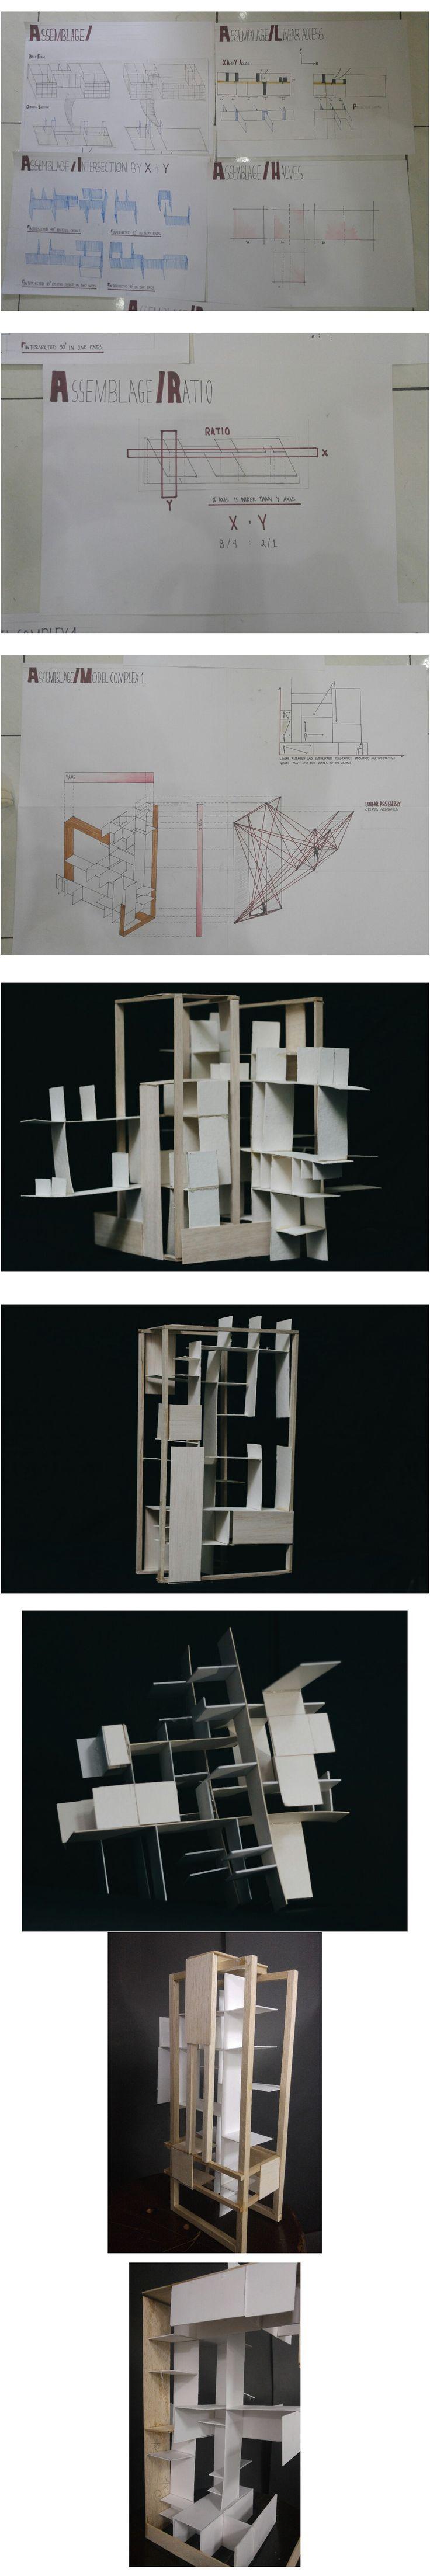 Assemblage - Ahmad Fadlan Awriya/Kelompok 2B/Fasilitator: Nadia Amira